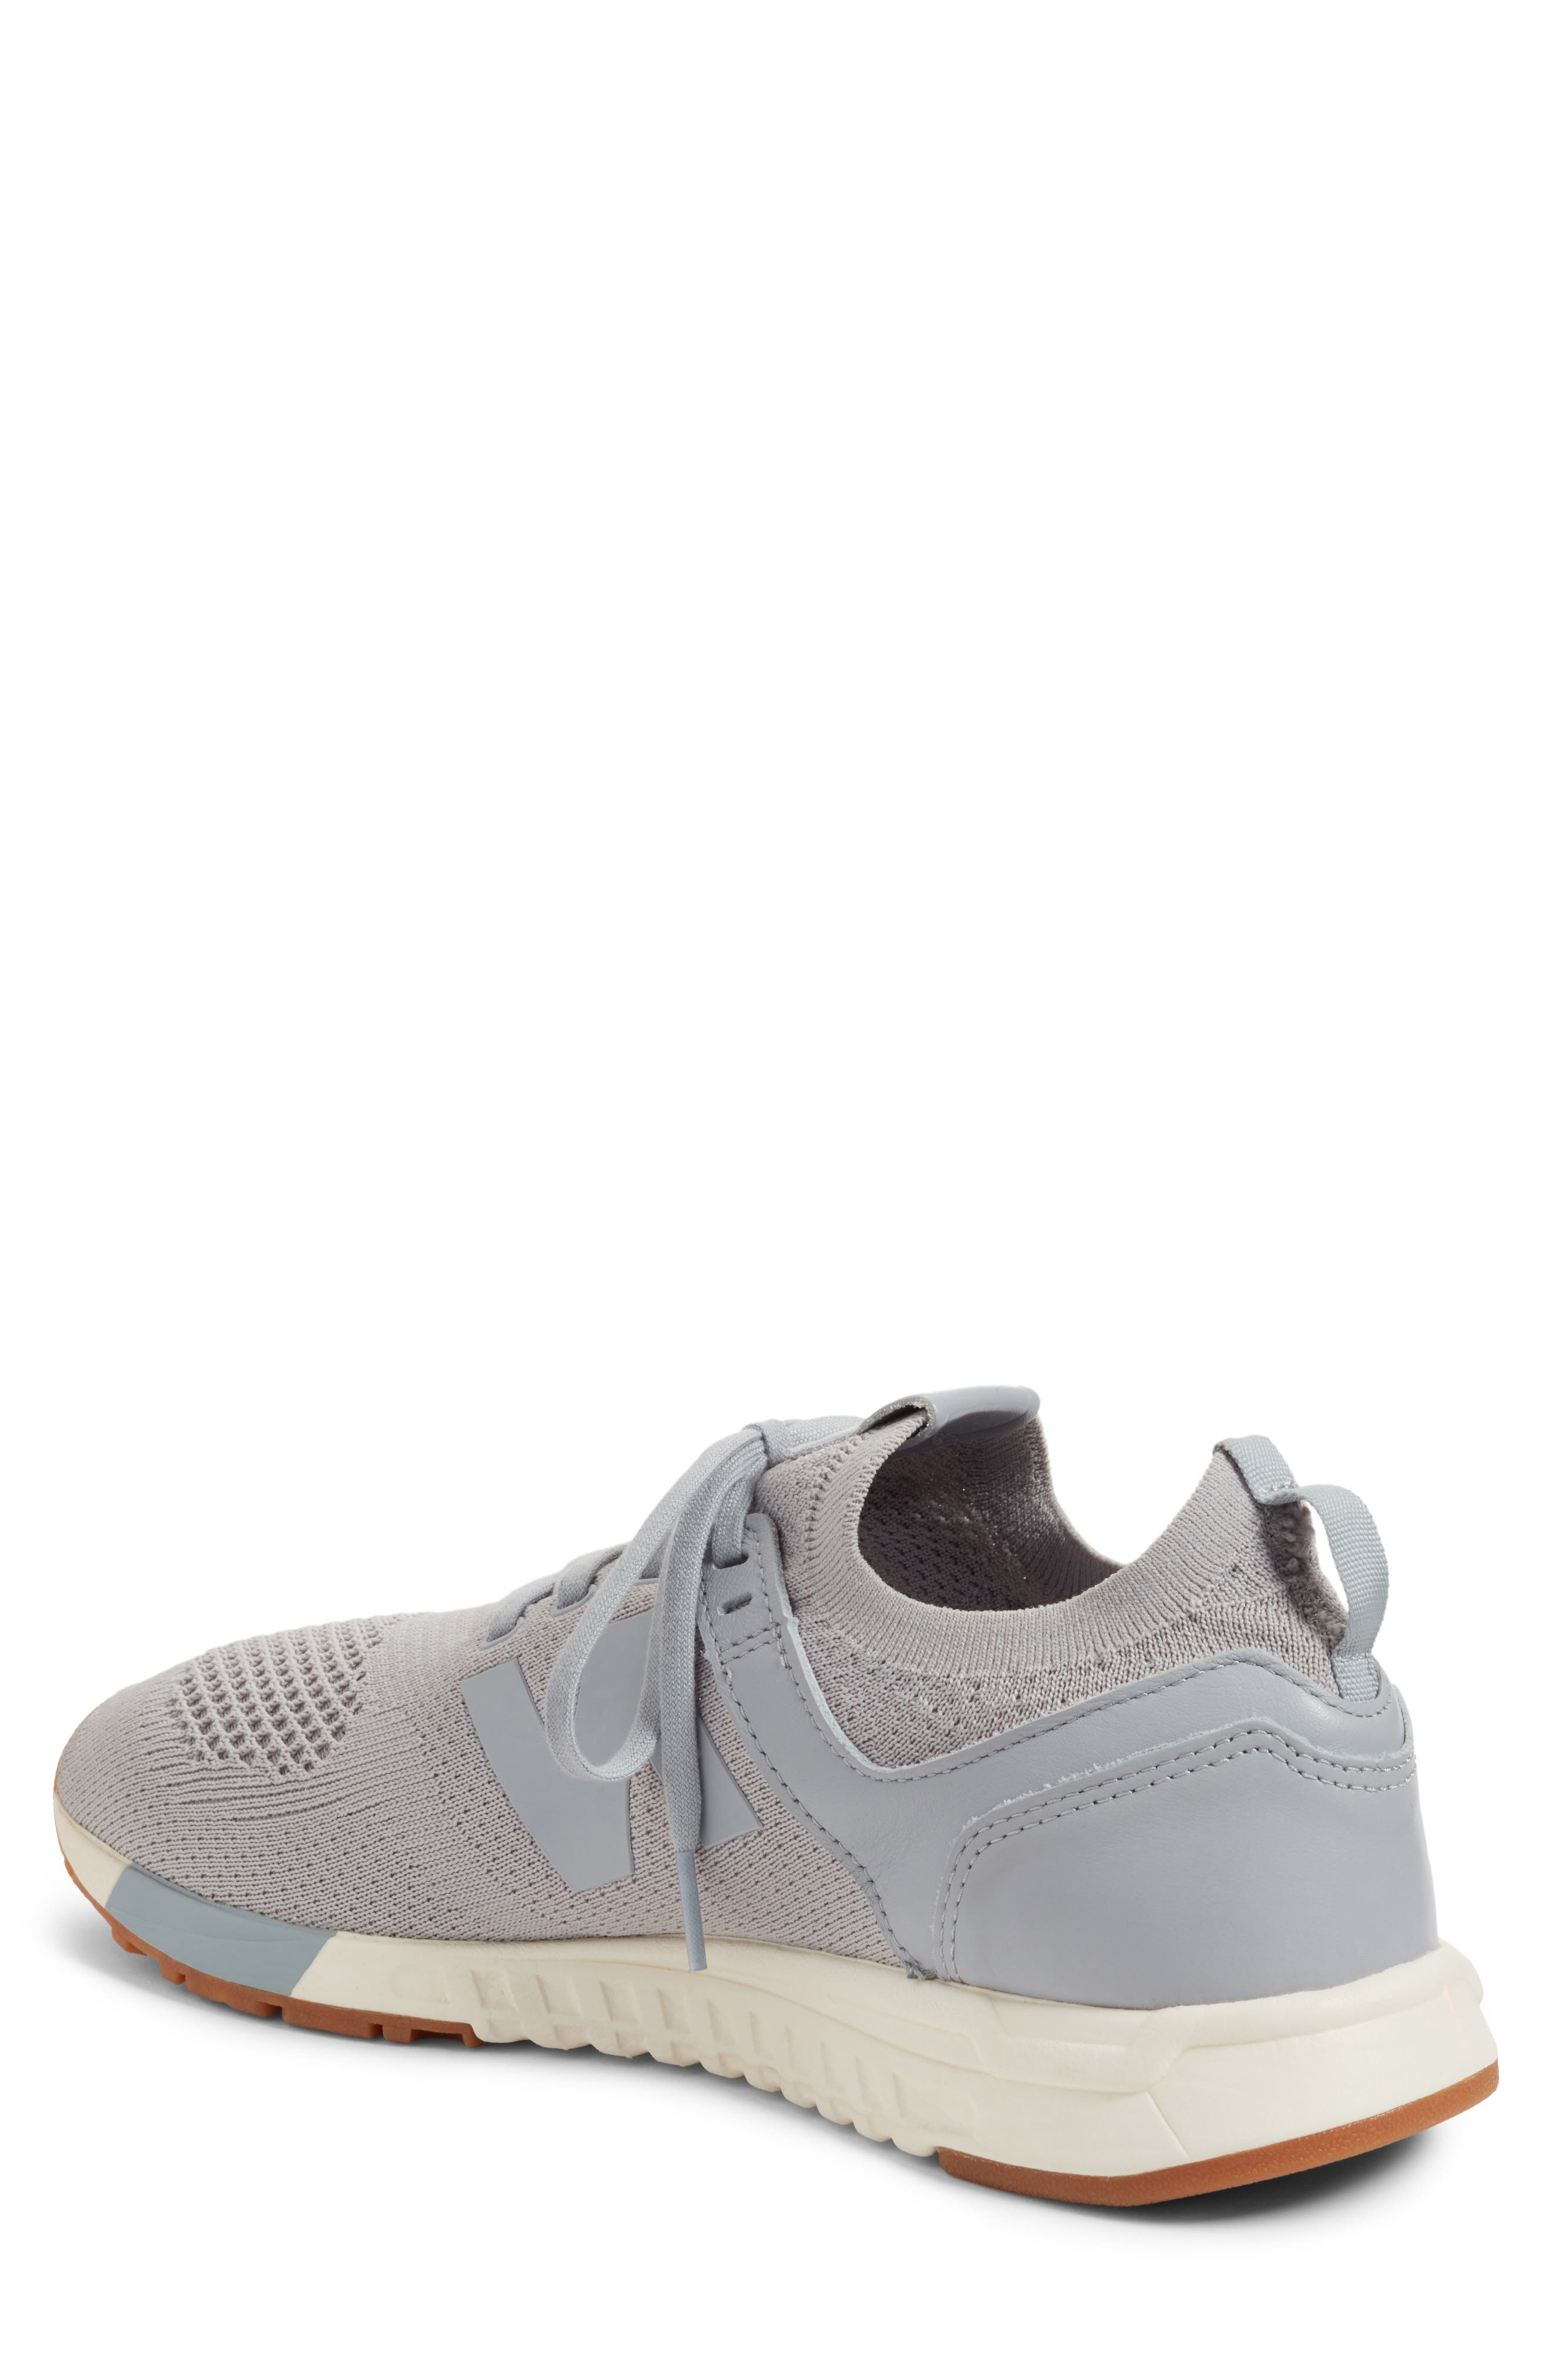 247 Decon Knit Sneaker,                             Alternate thumbnail 7, color,